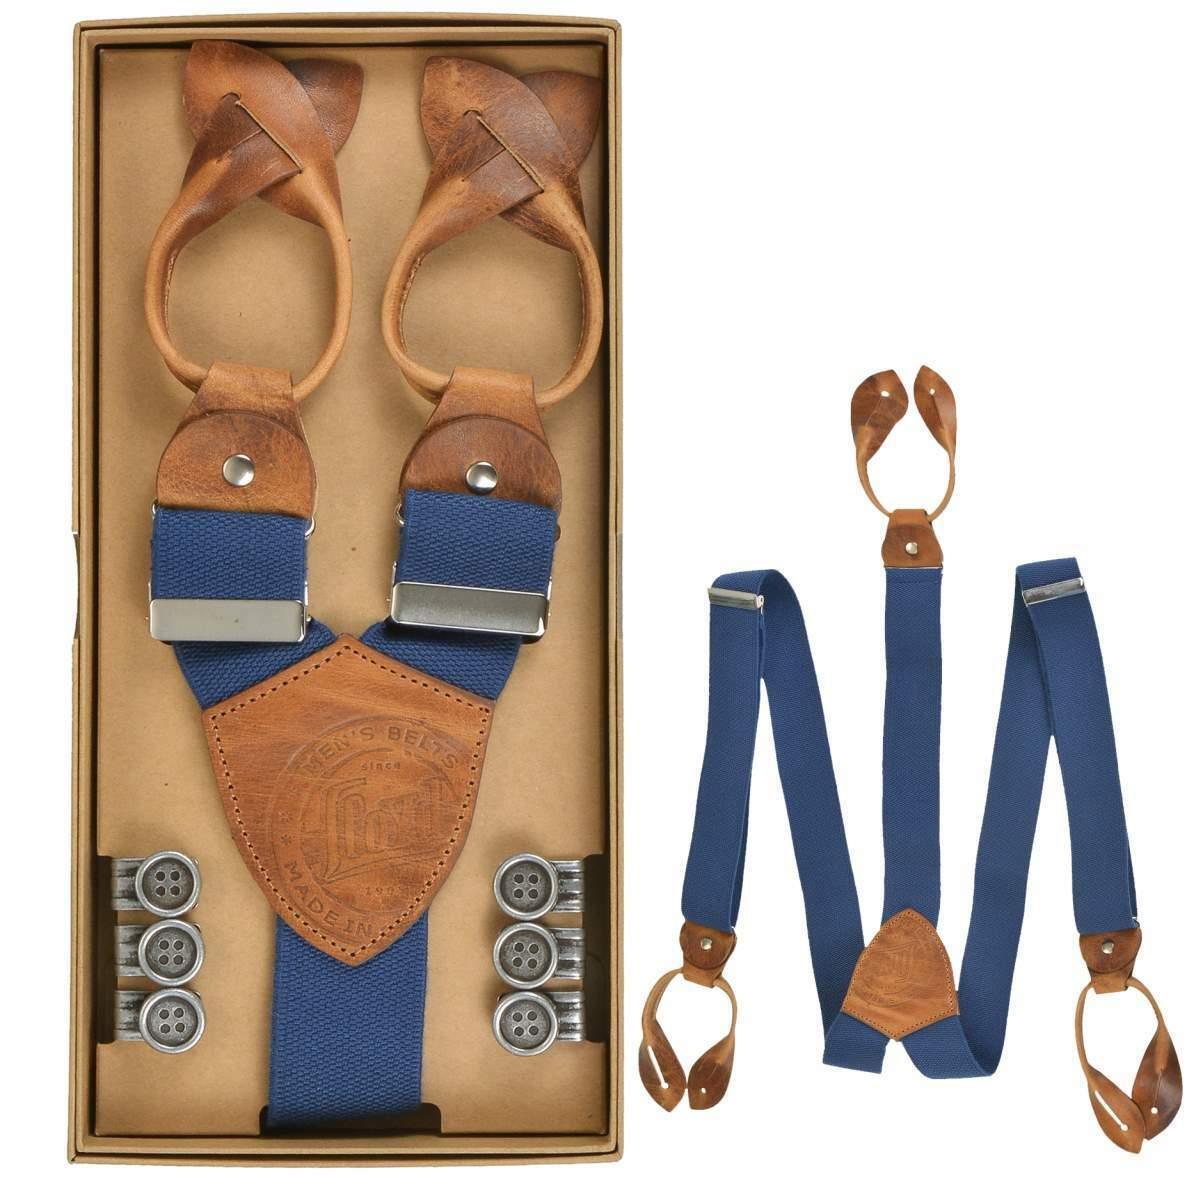 Lloyd Hosenträger Y Form Holländer 120cm 35mm Leder mit Knöpfen 6726 royal blau